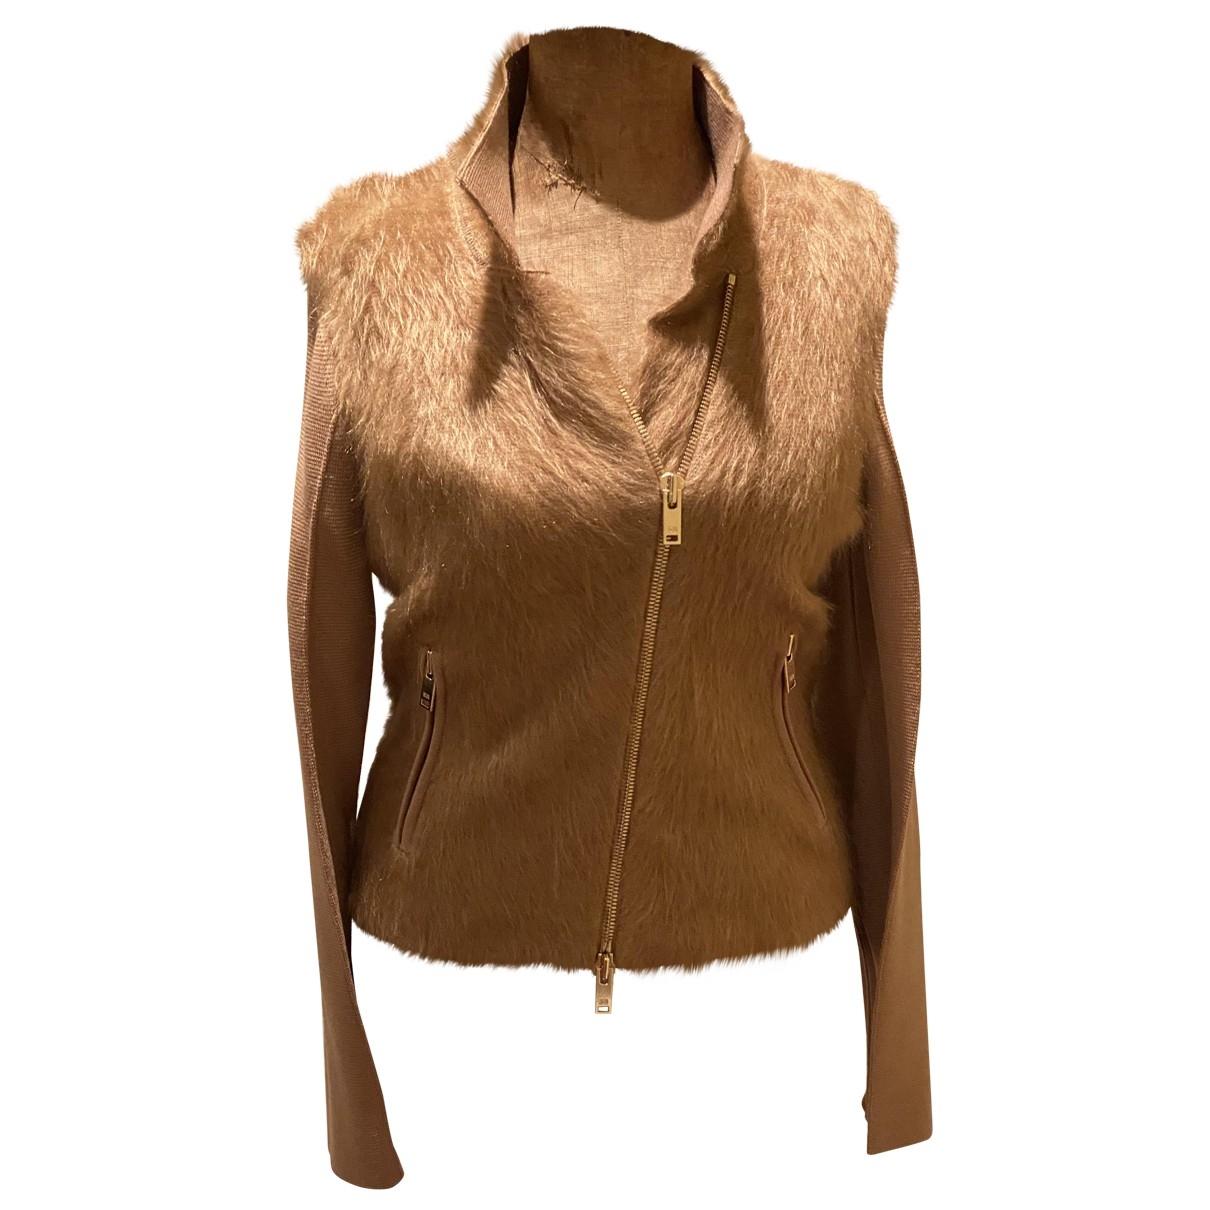 Sonia Rykiel \N Camel Wool jacket for Women 40 FR